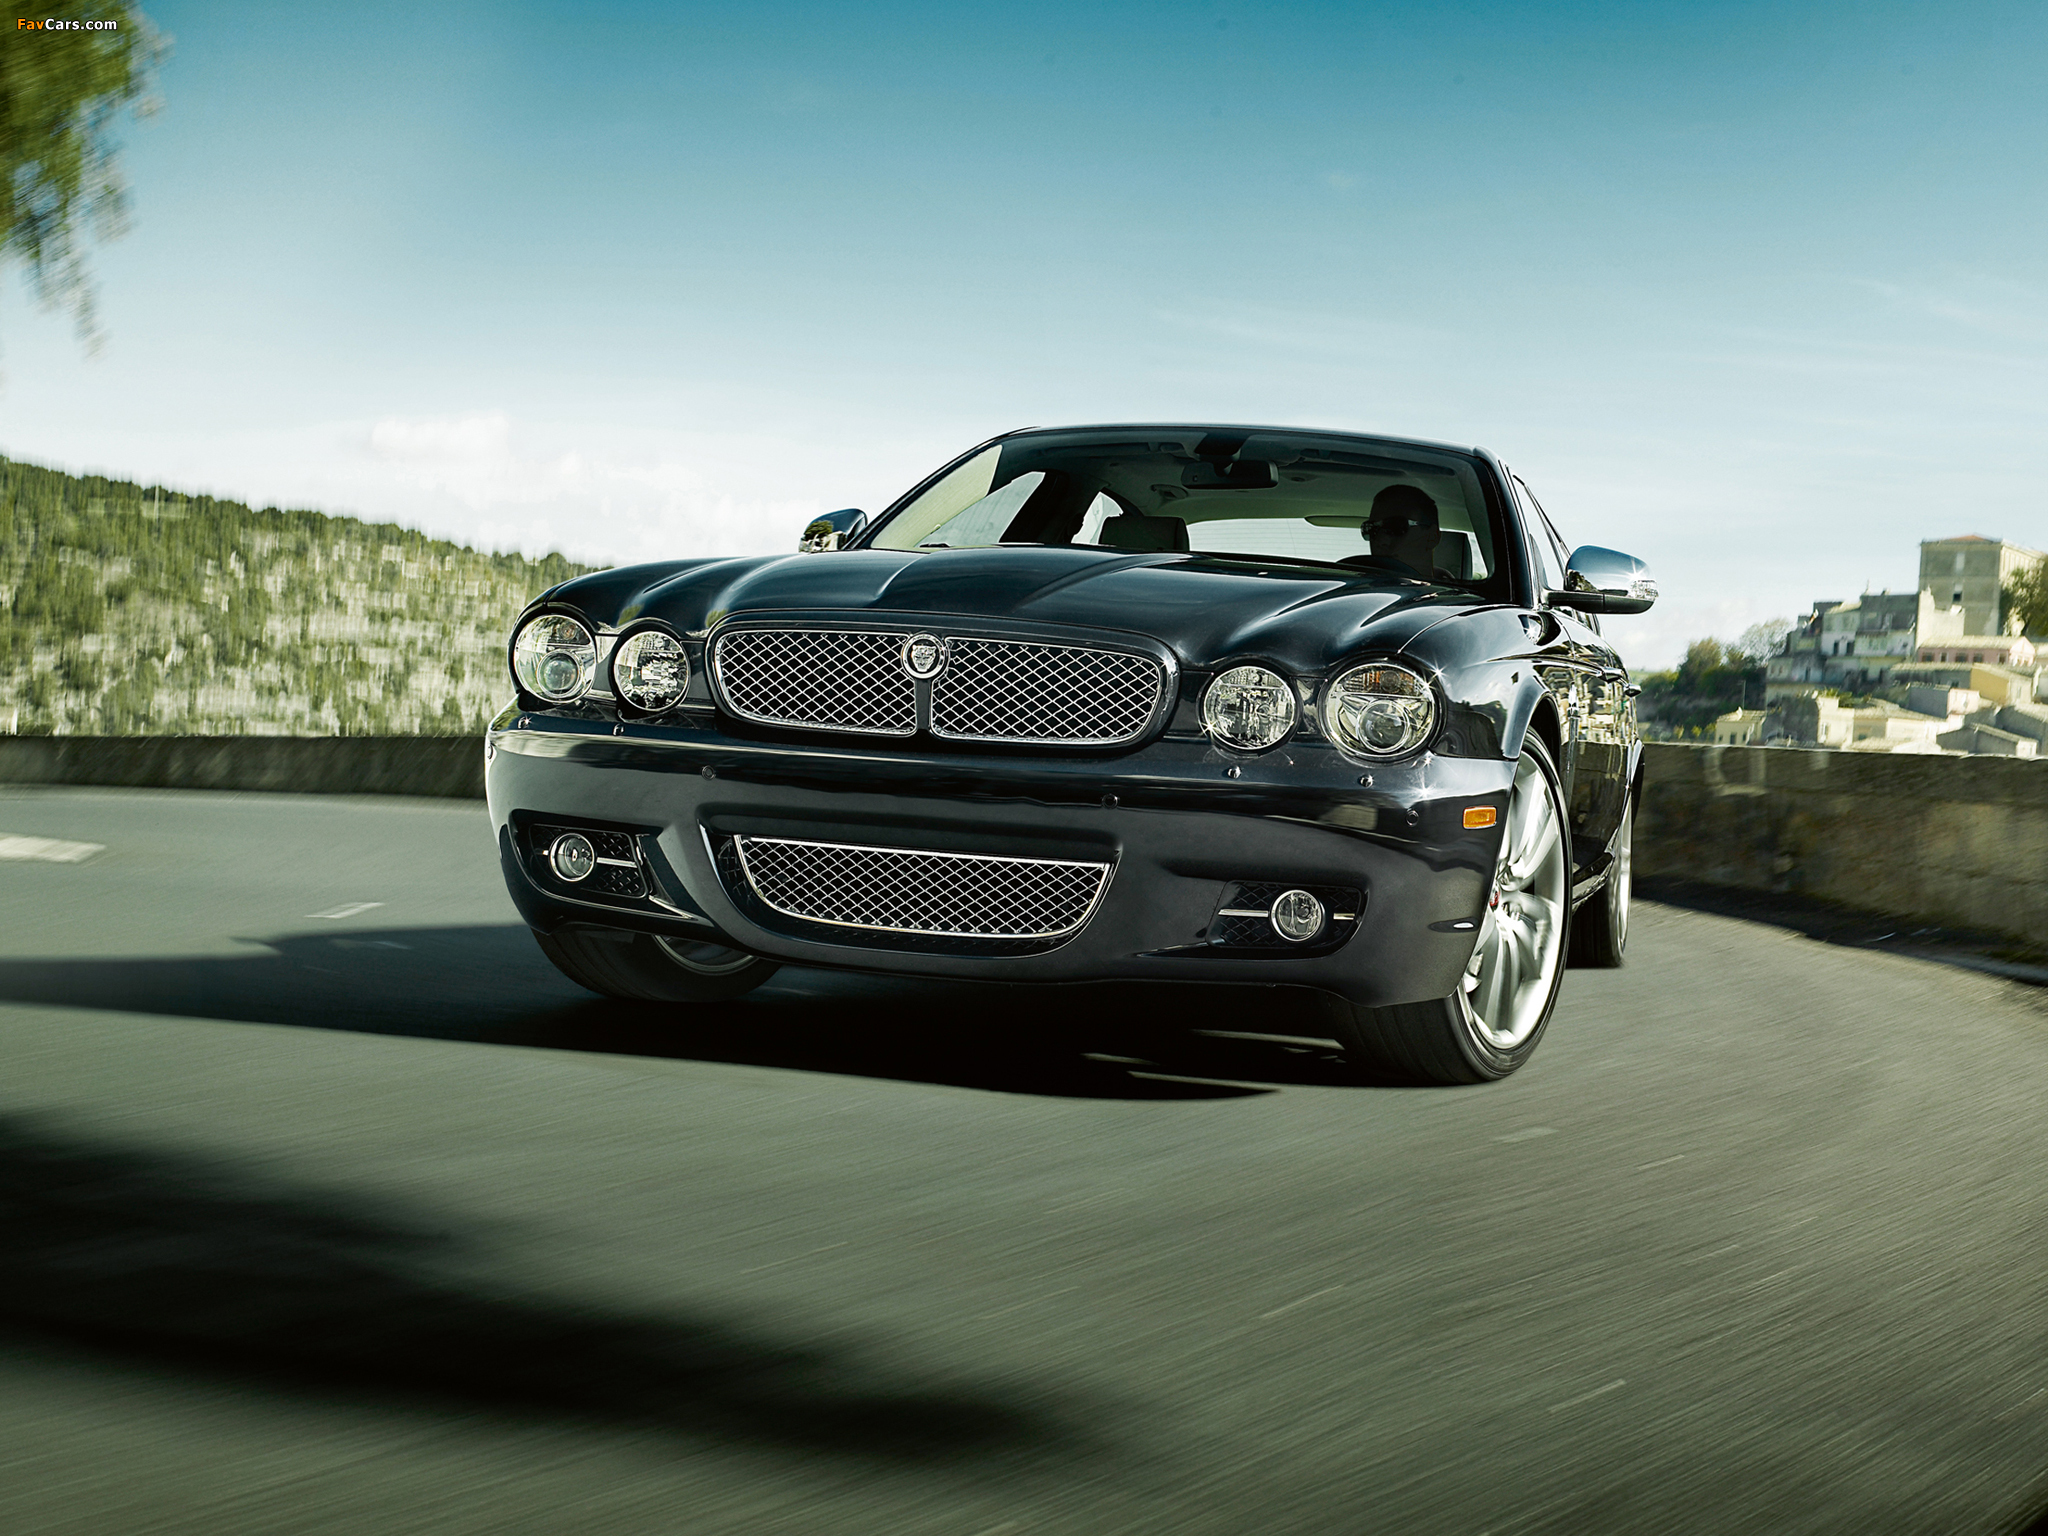 Jaguar XJ Portfolio (X358) 2008 pictures (2048x1536)